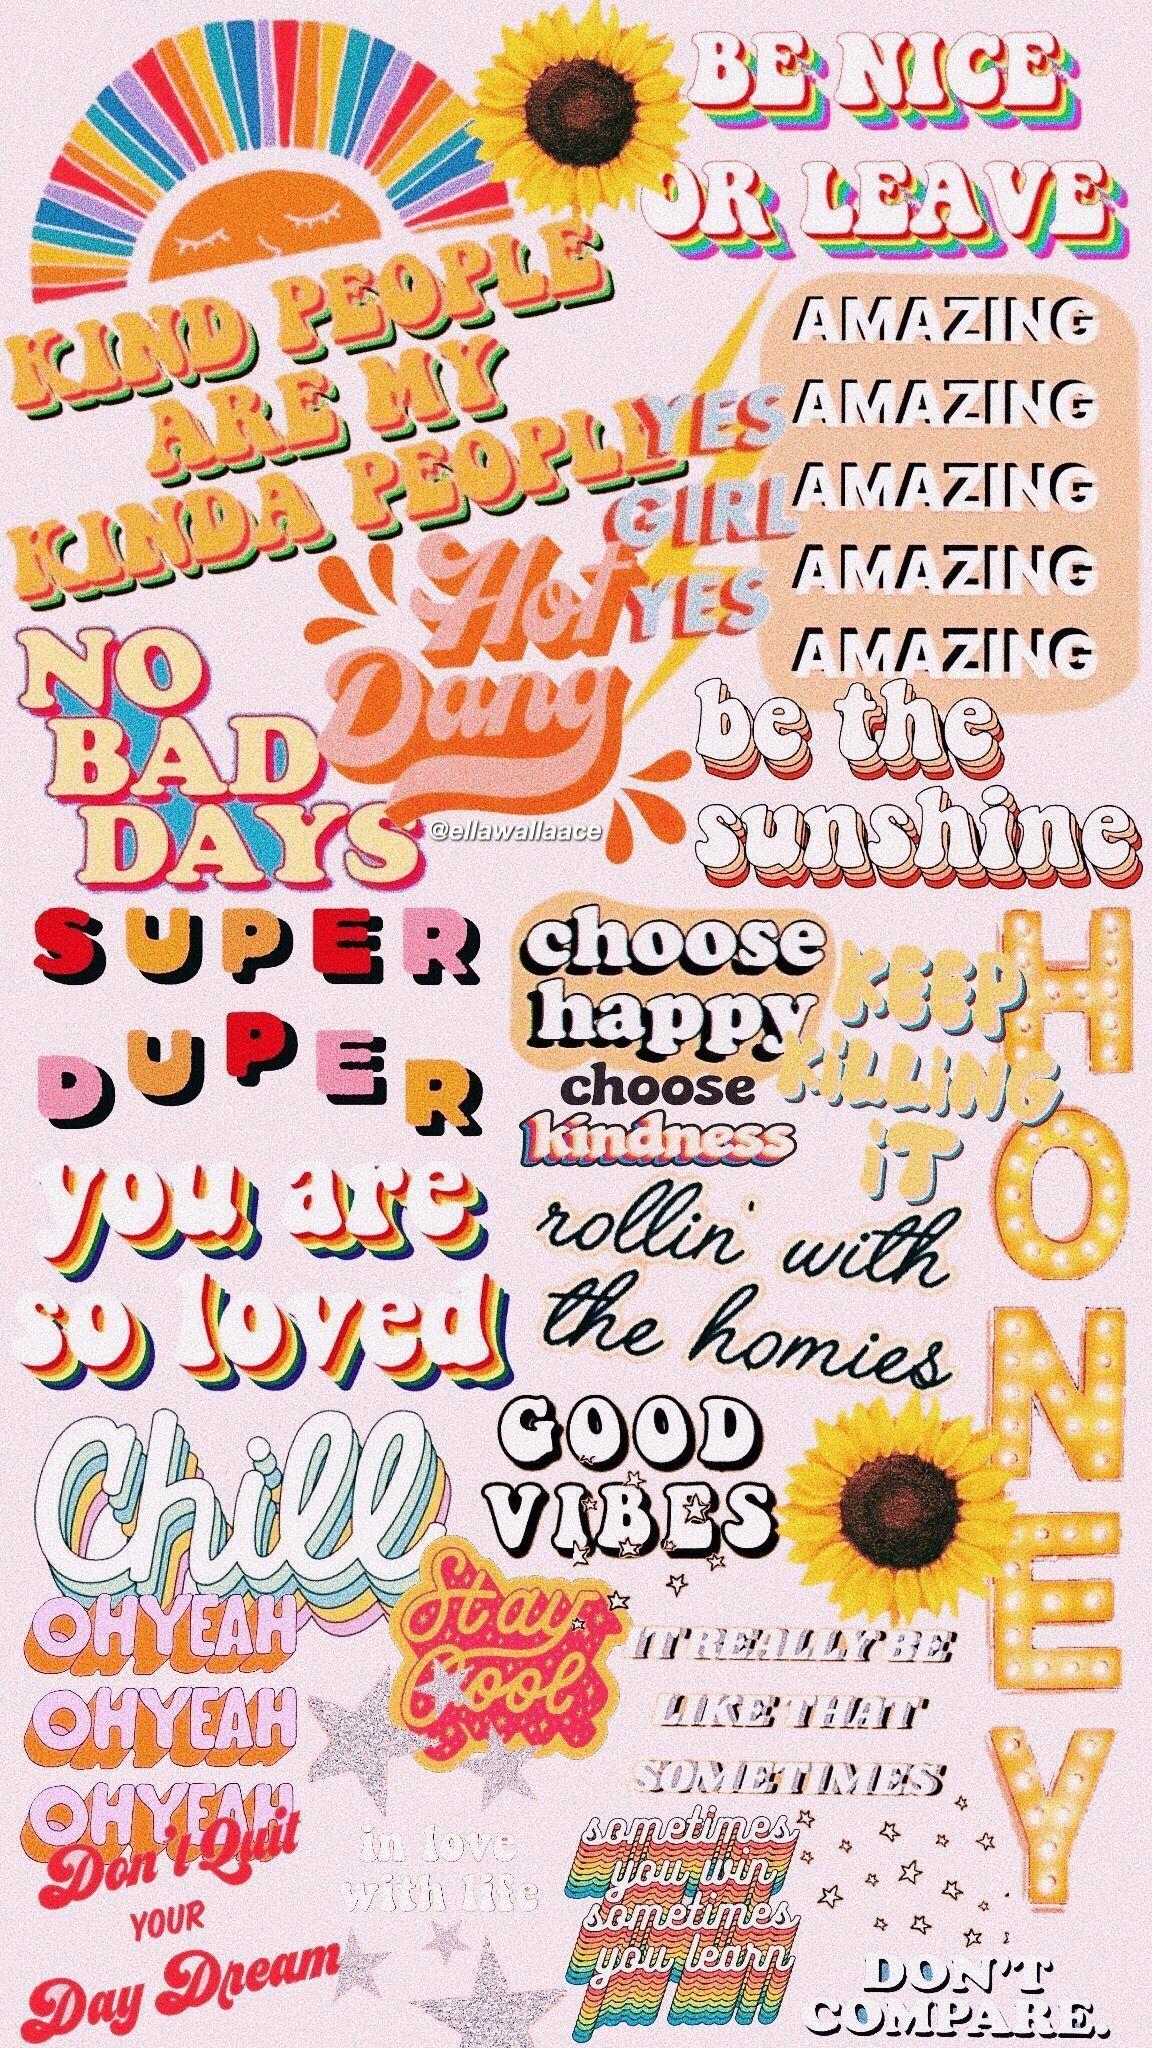 Background Backgrounds Hintergrund Background Backgrounds Iphonebackgrounds Iphone Wallpaper Vsco Aesthetic Iphone Wallpaper Iphone Wallpaper Vintage